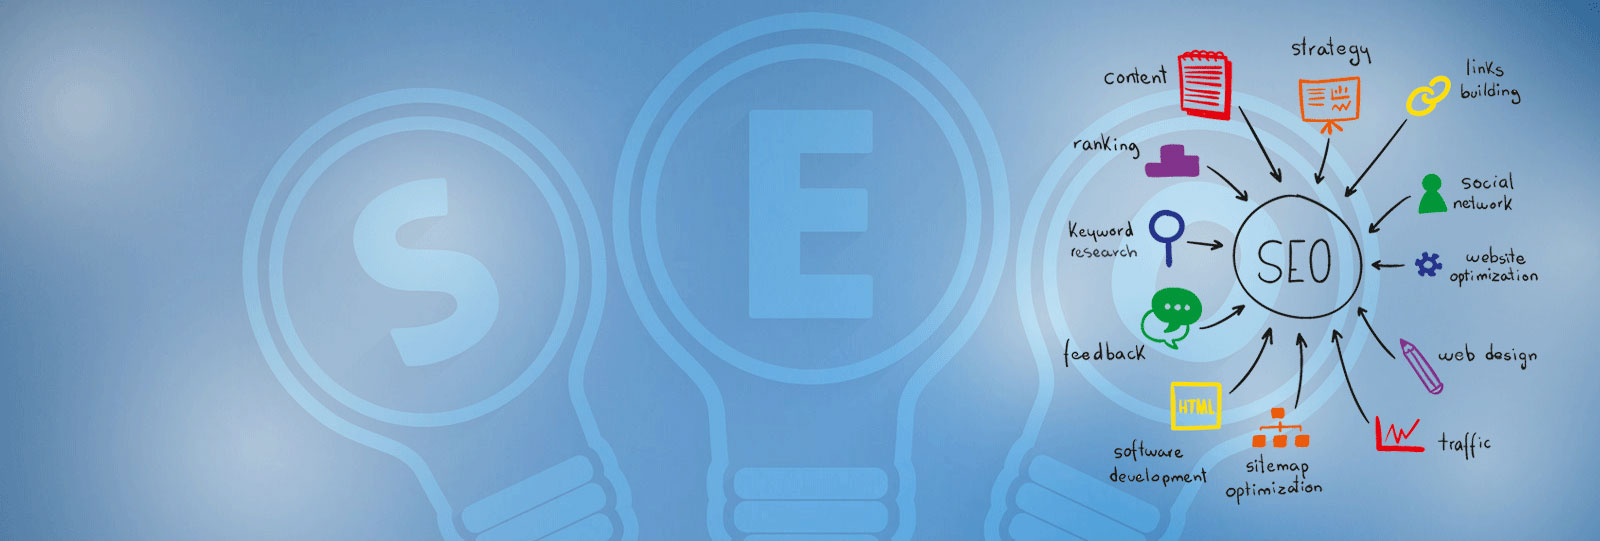 Internal Linking & its Impact on SEO